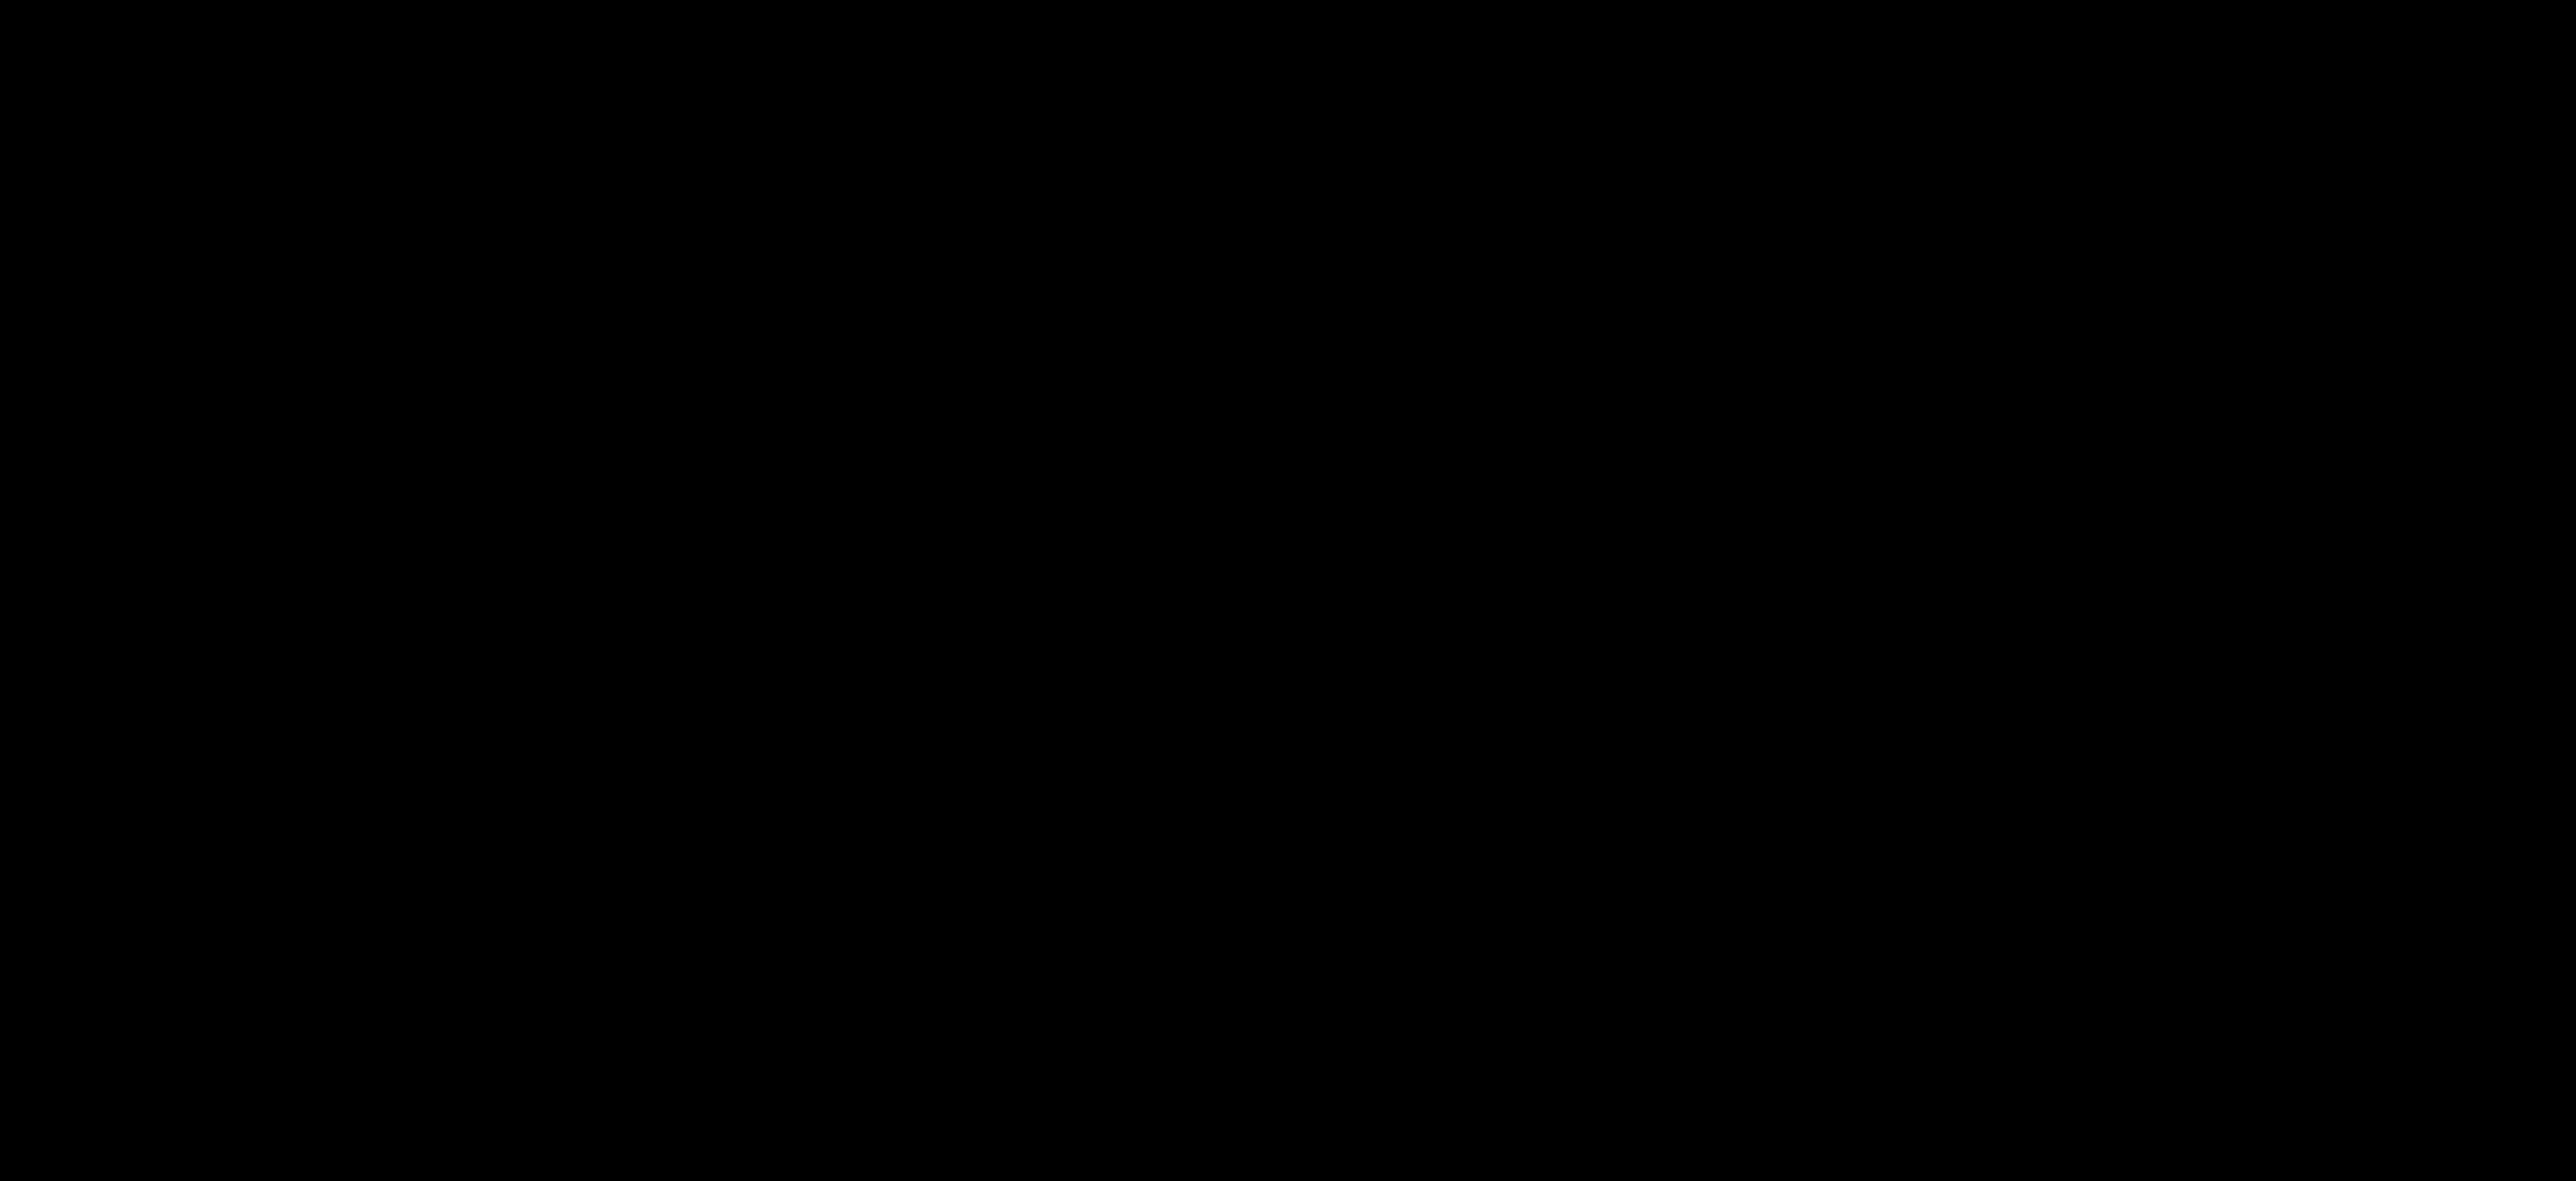 20200205_113102